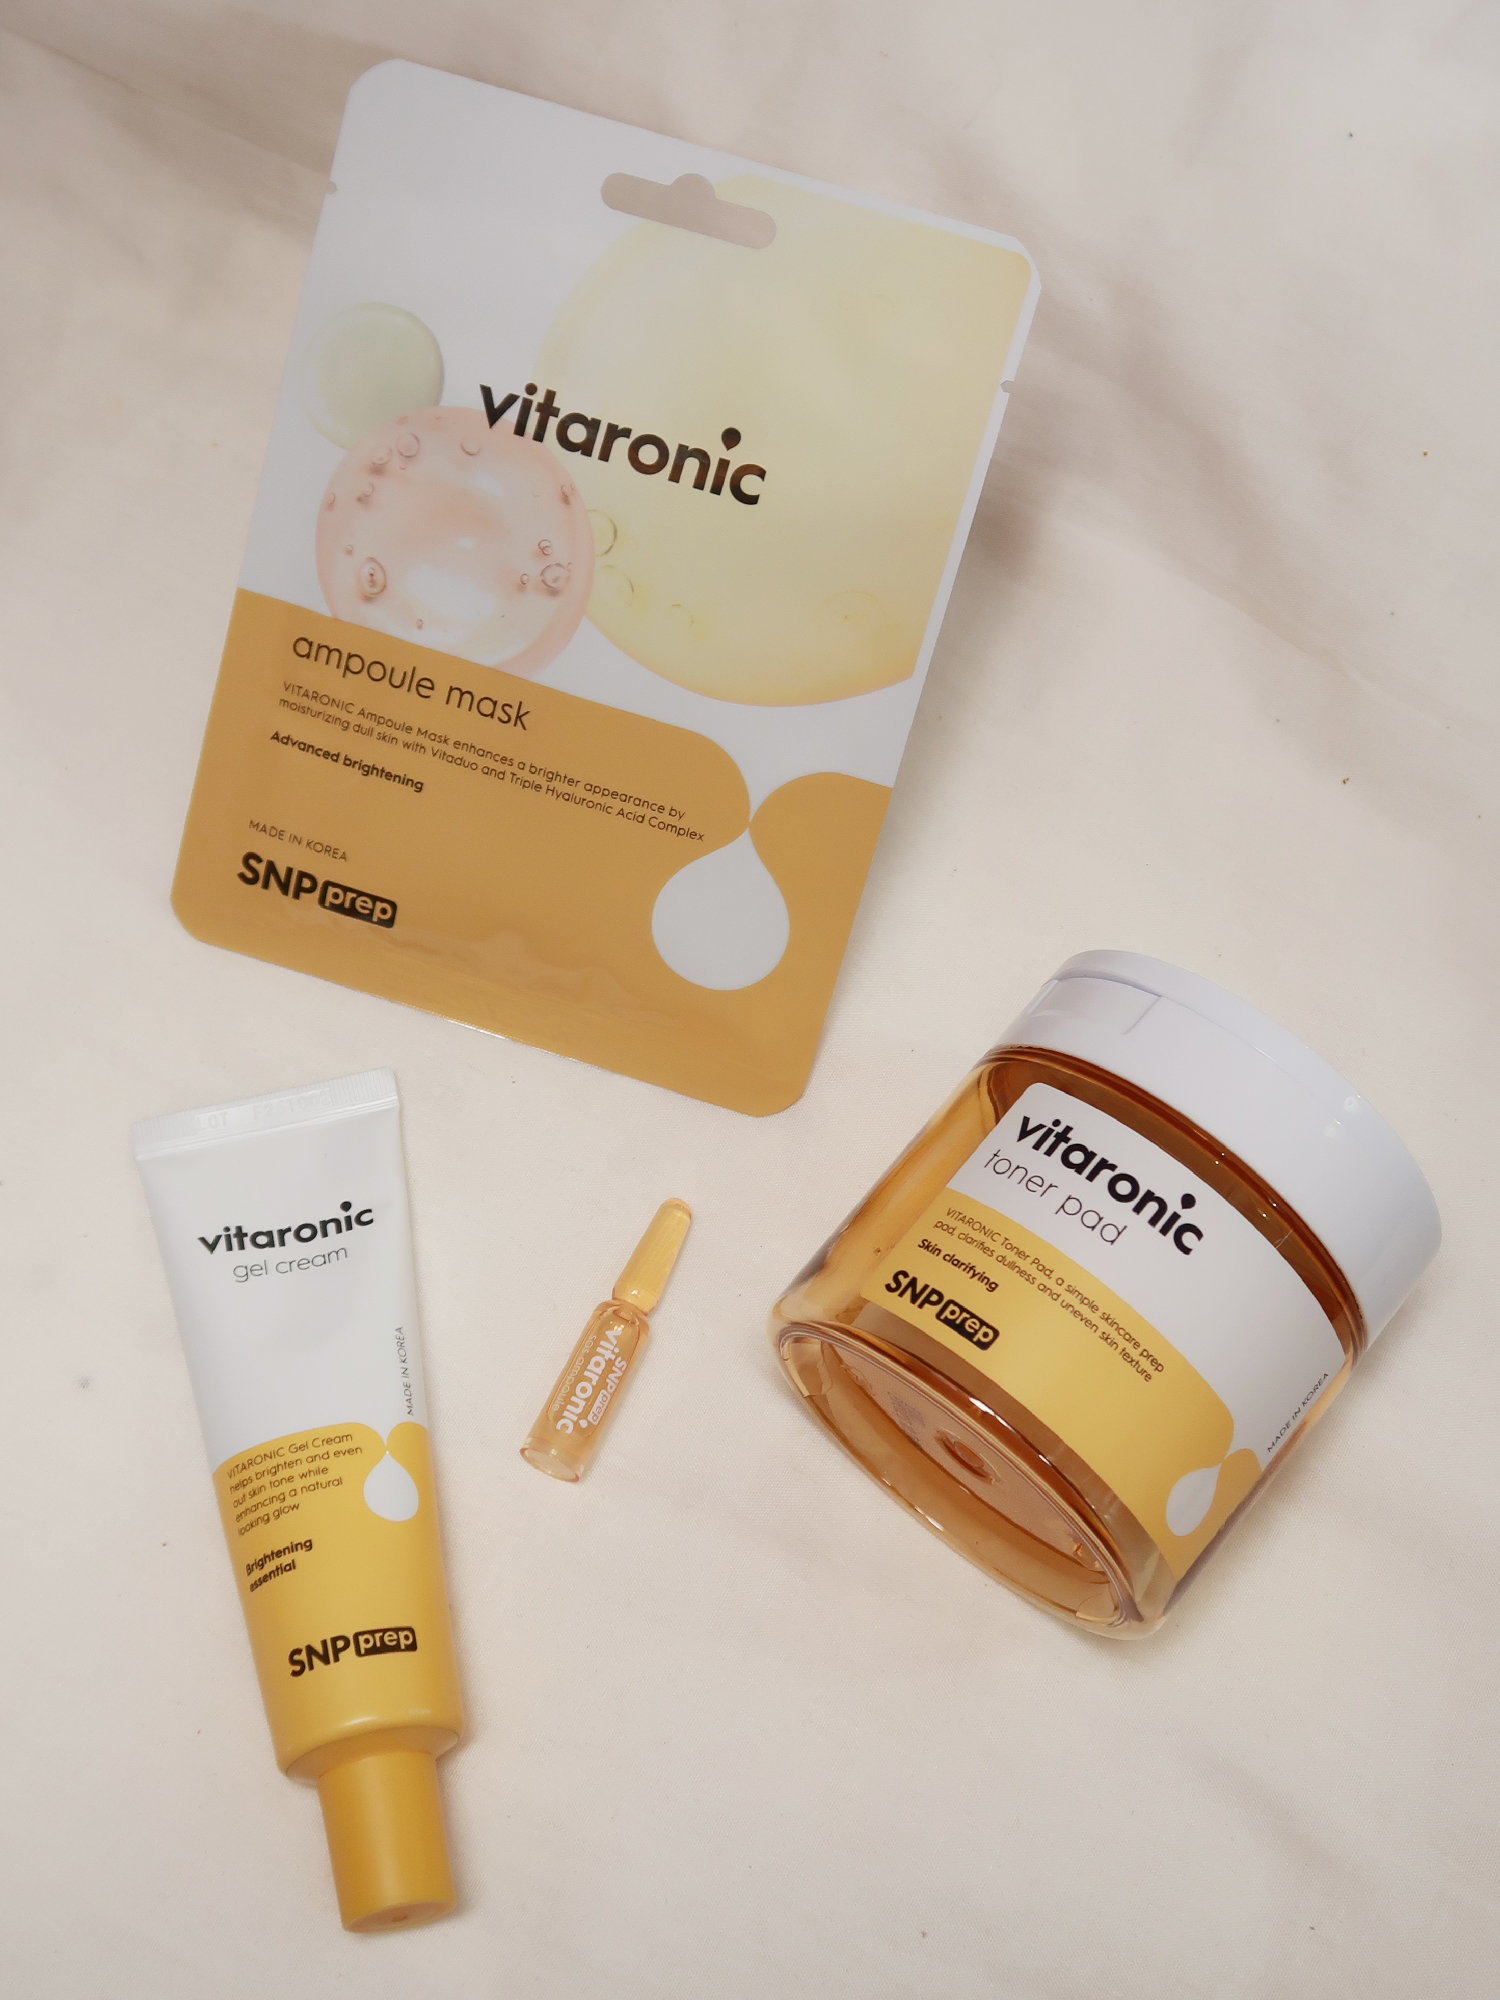 Prep Vitaronic Toner Pad, SoS Ampoule, Gel Cream, and Ampoule Mask